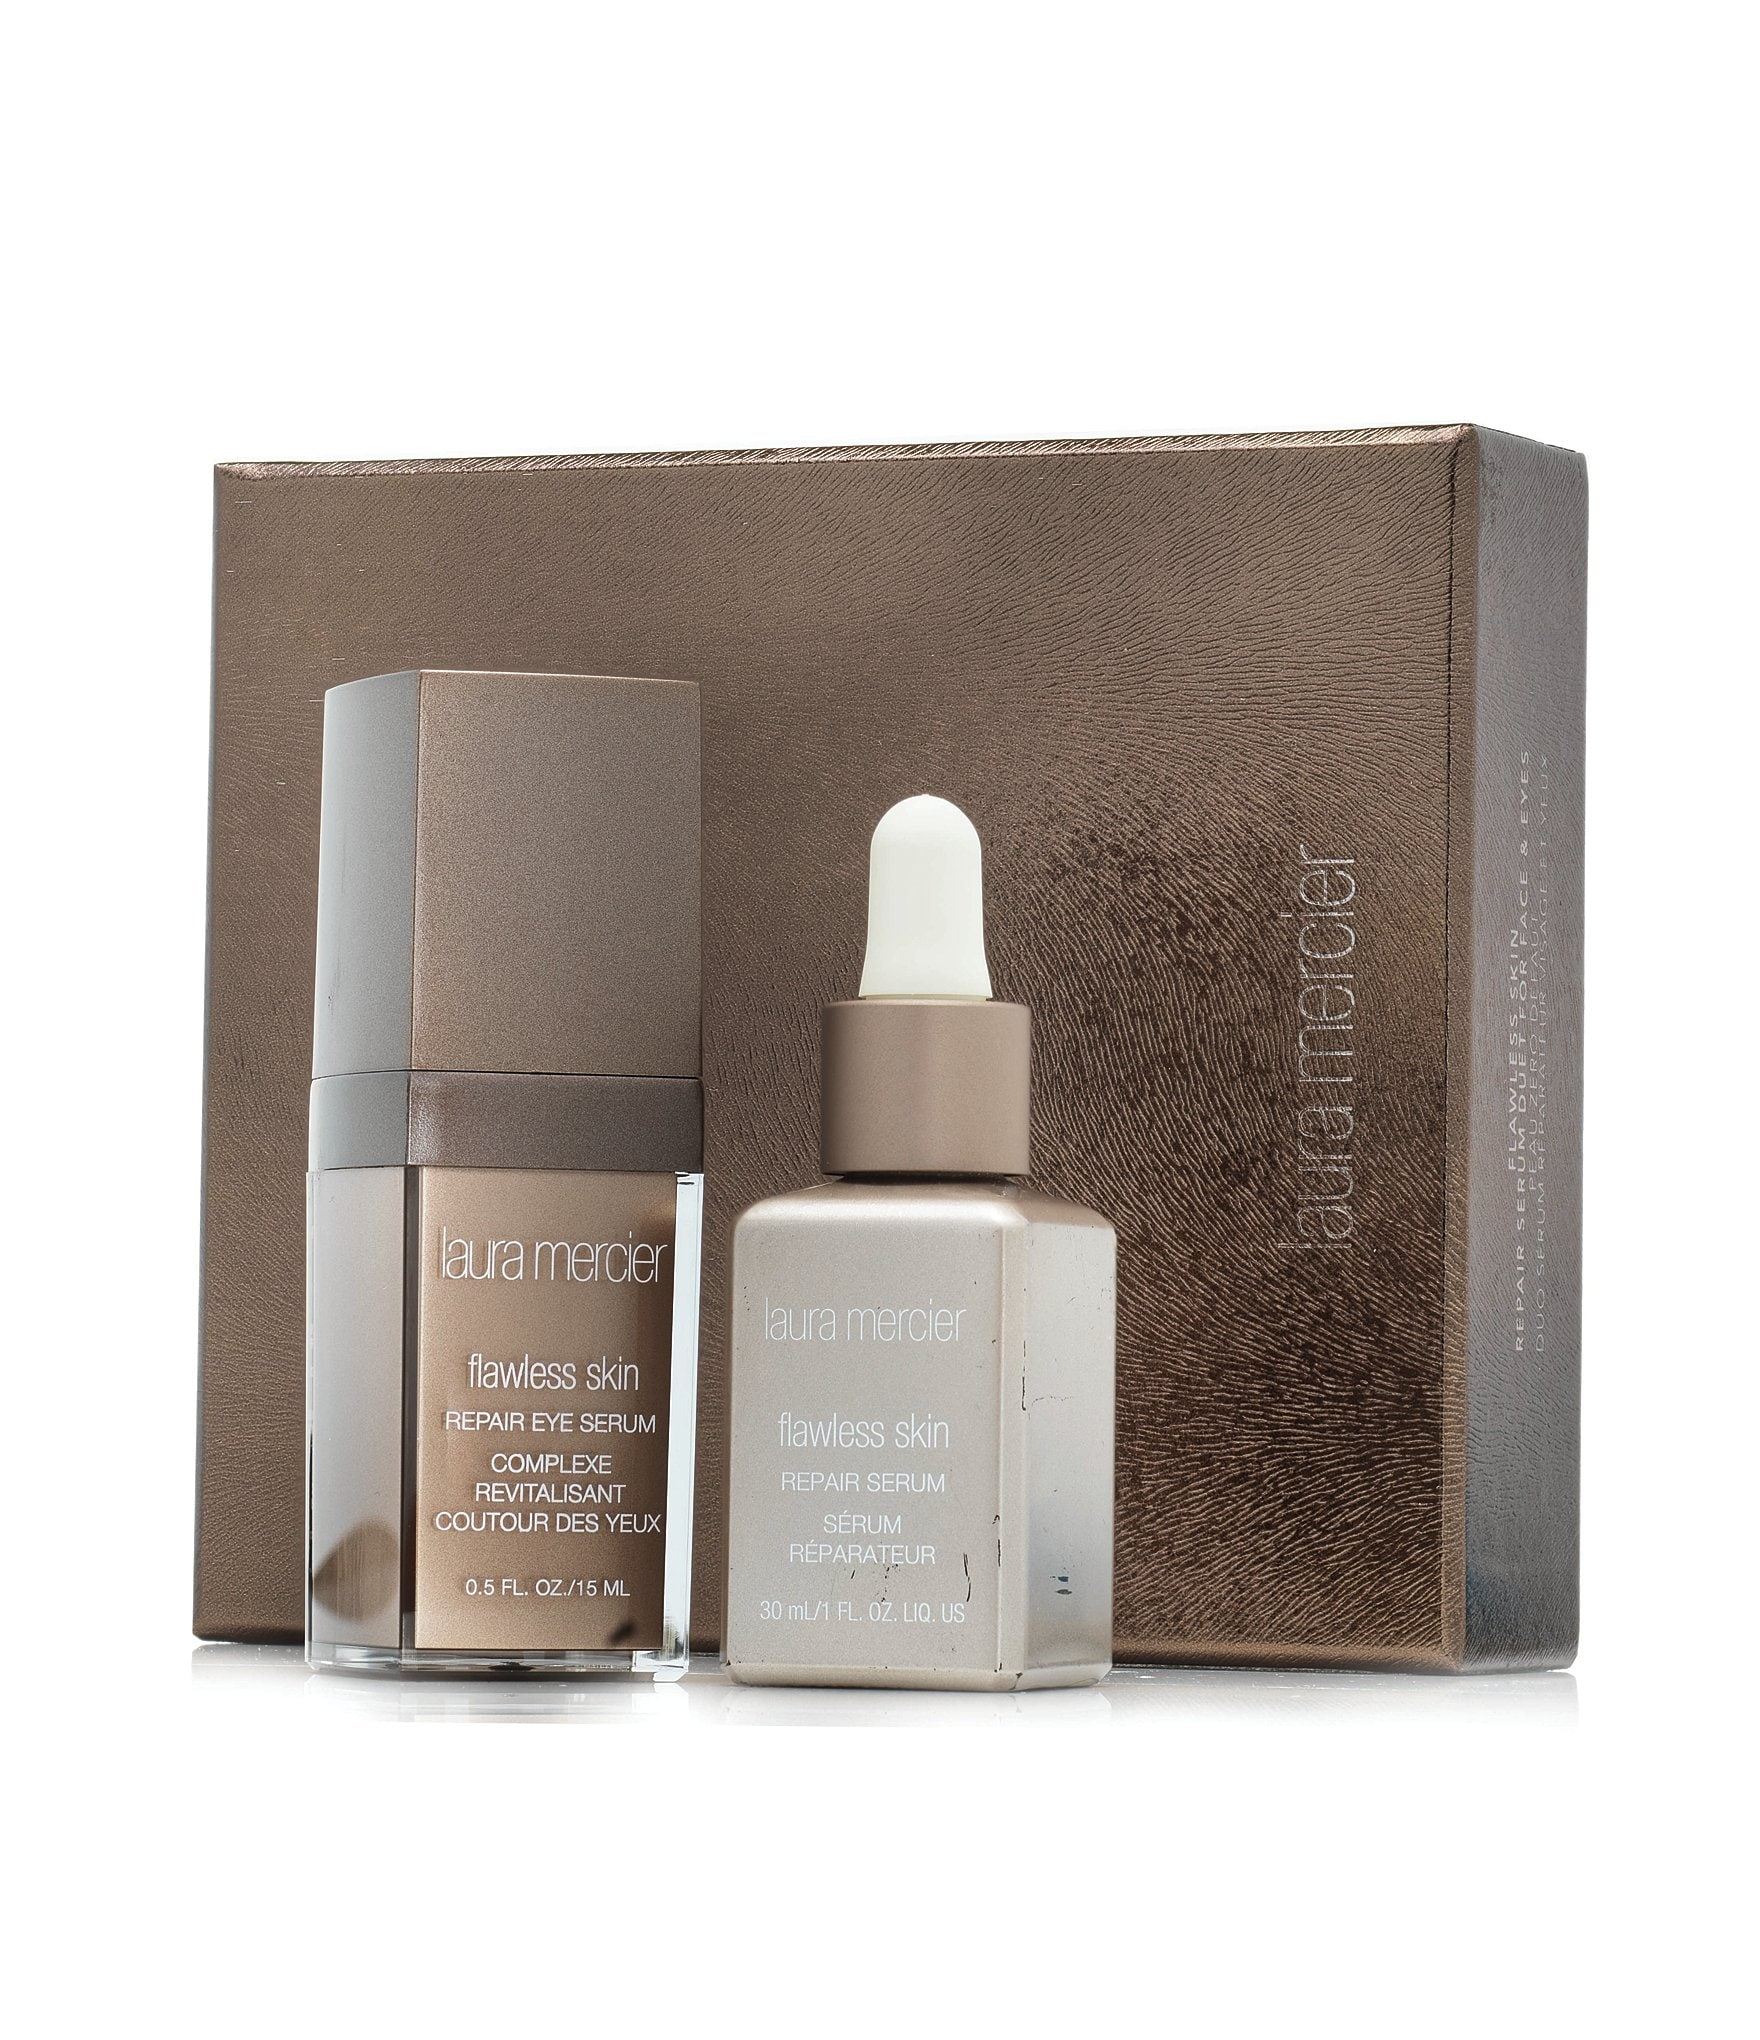 laura mercier Beauty   Gifts & Value Sets   Dillards.com